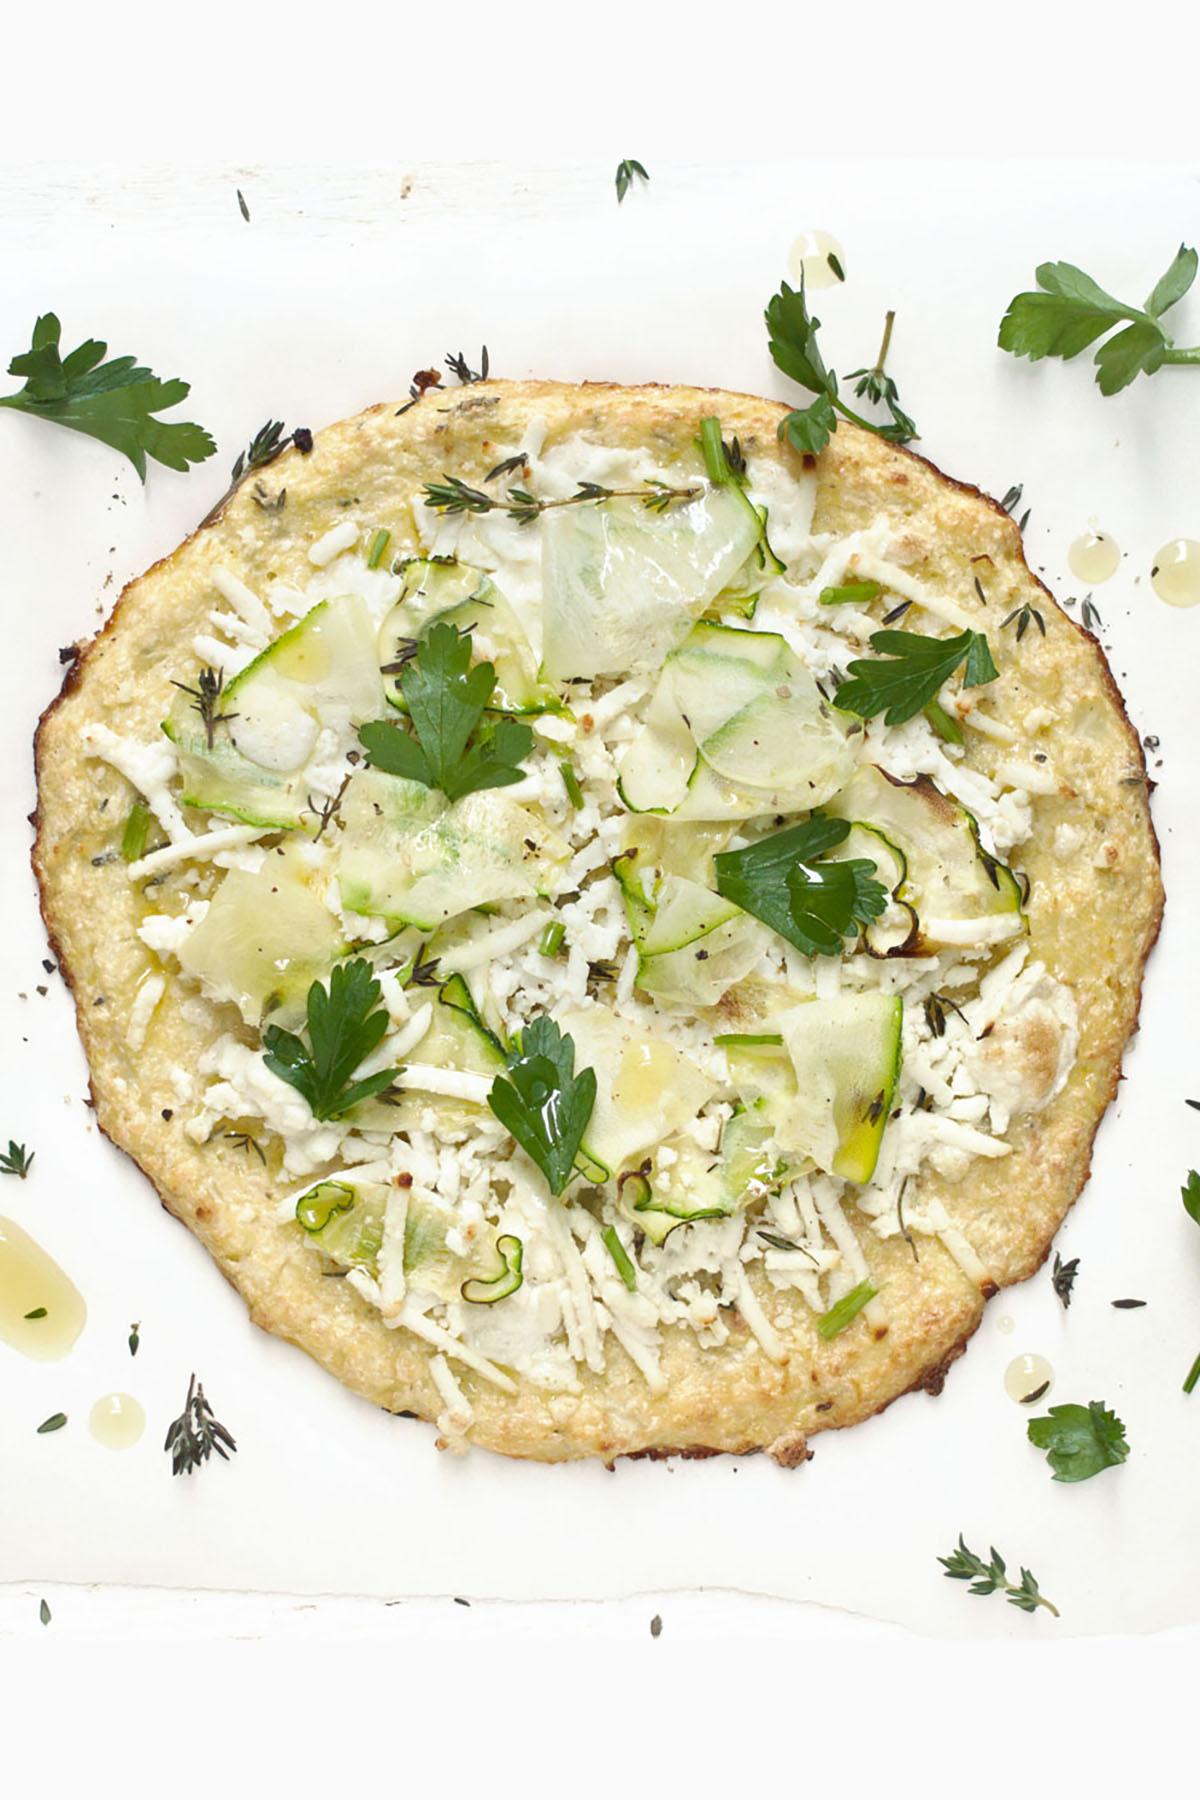 Cauliflower Pizza Crust with Zucchini and Fresh Herbs